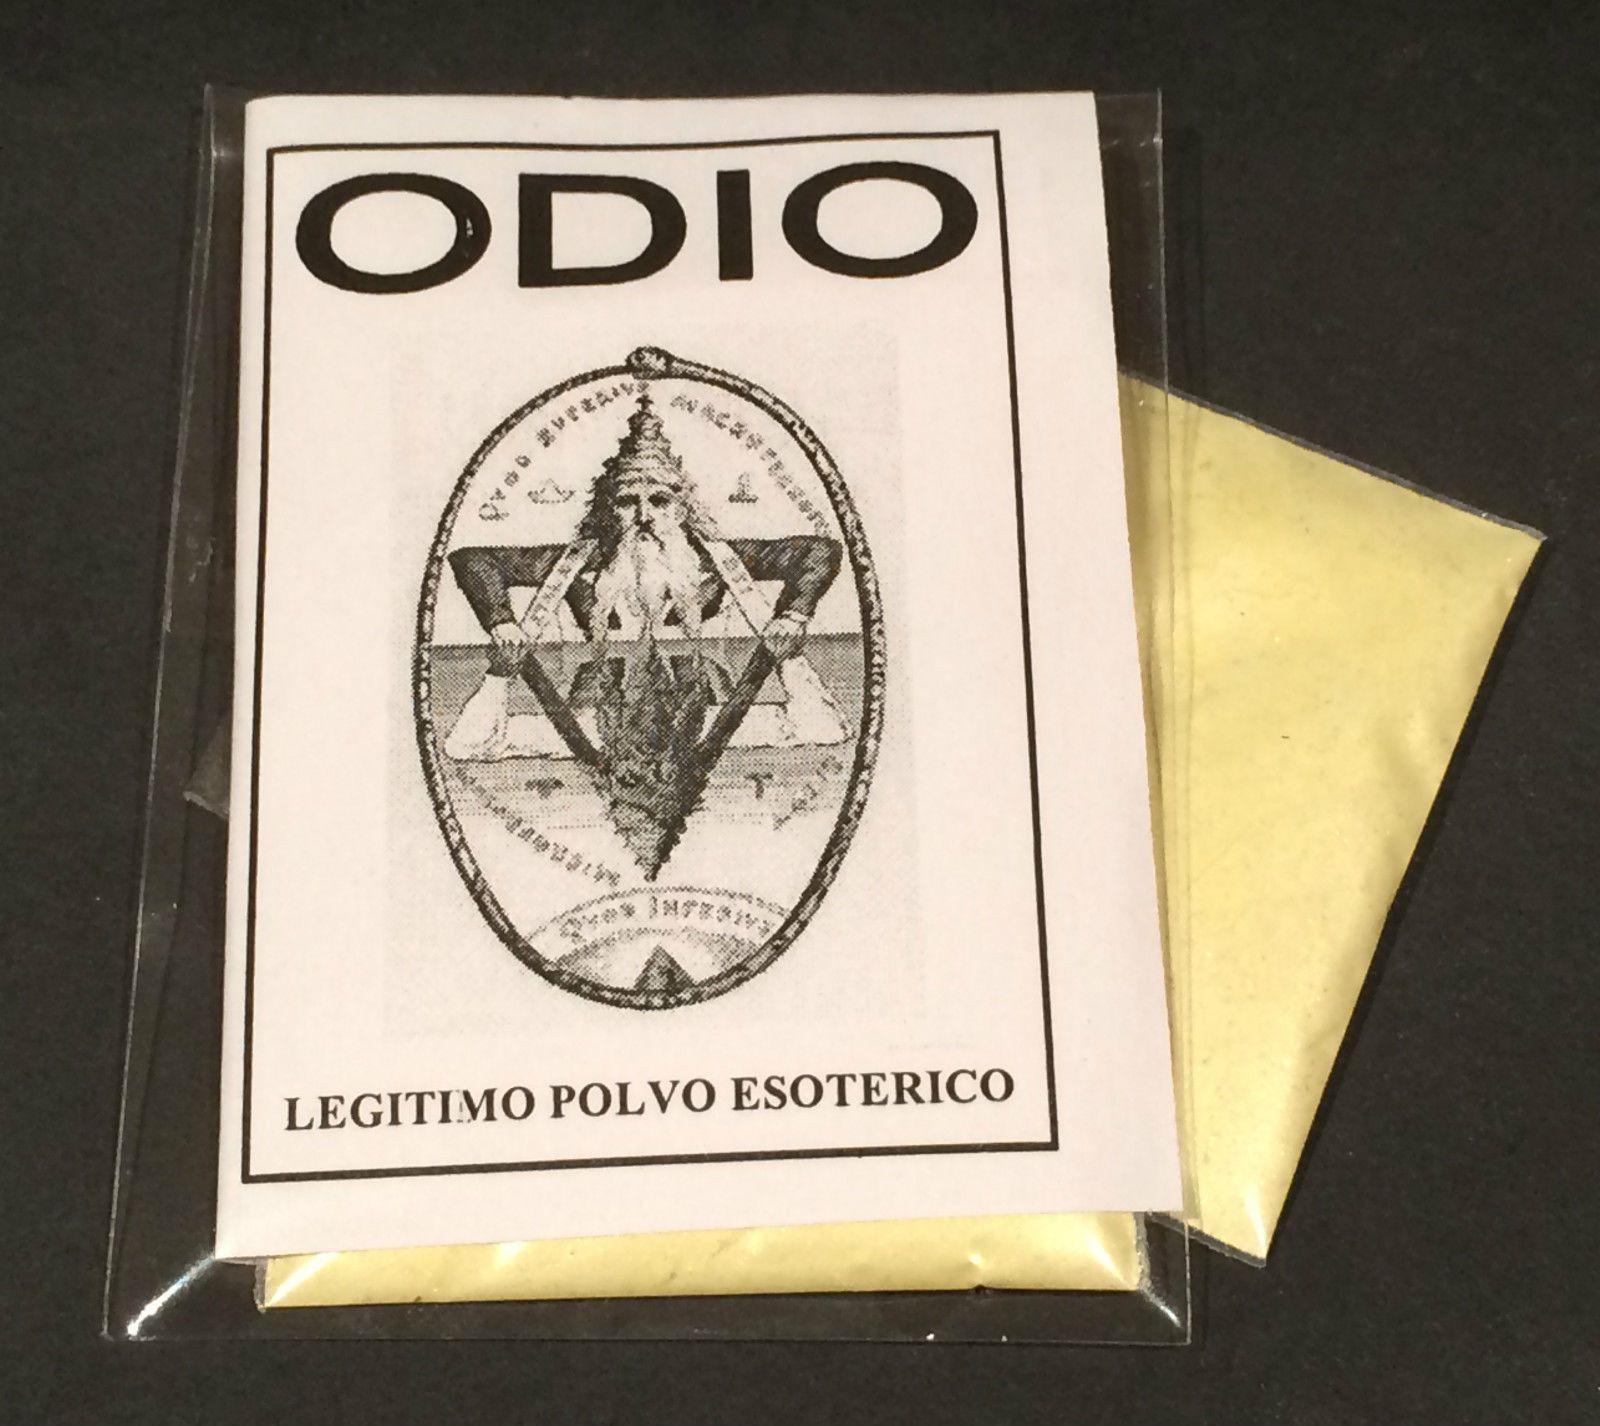 "LEGITIMO POLVO ESOTERICO ESPECIAL "" ODIO """